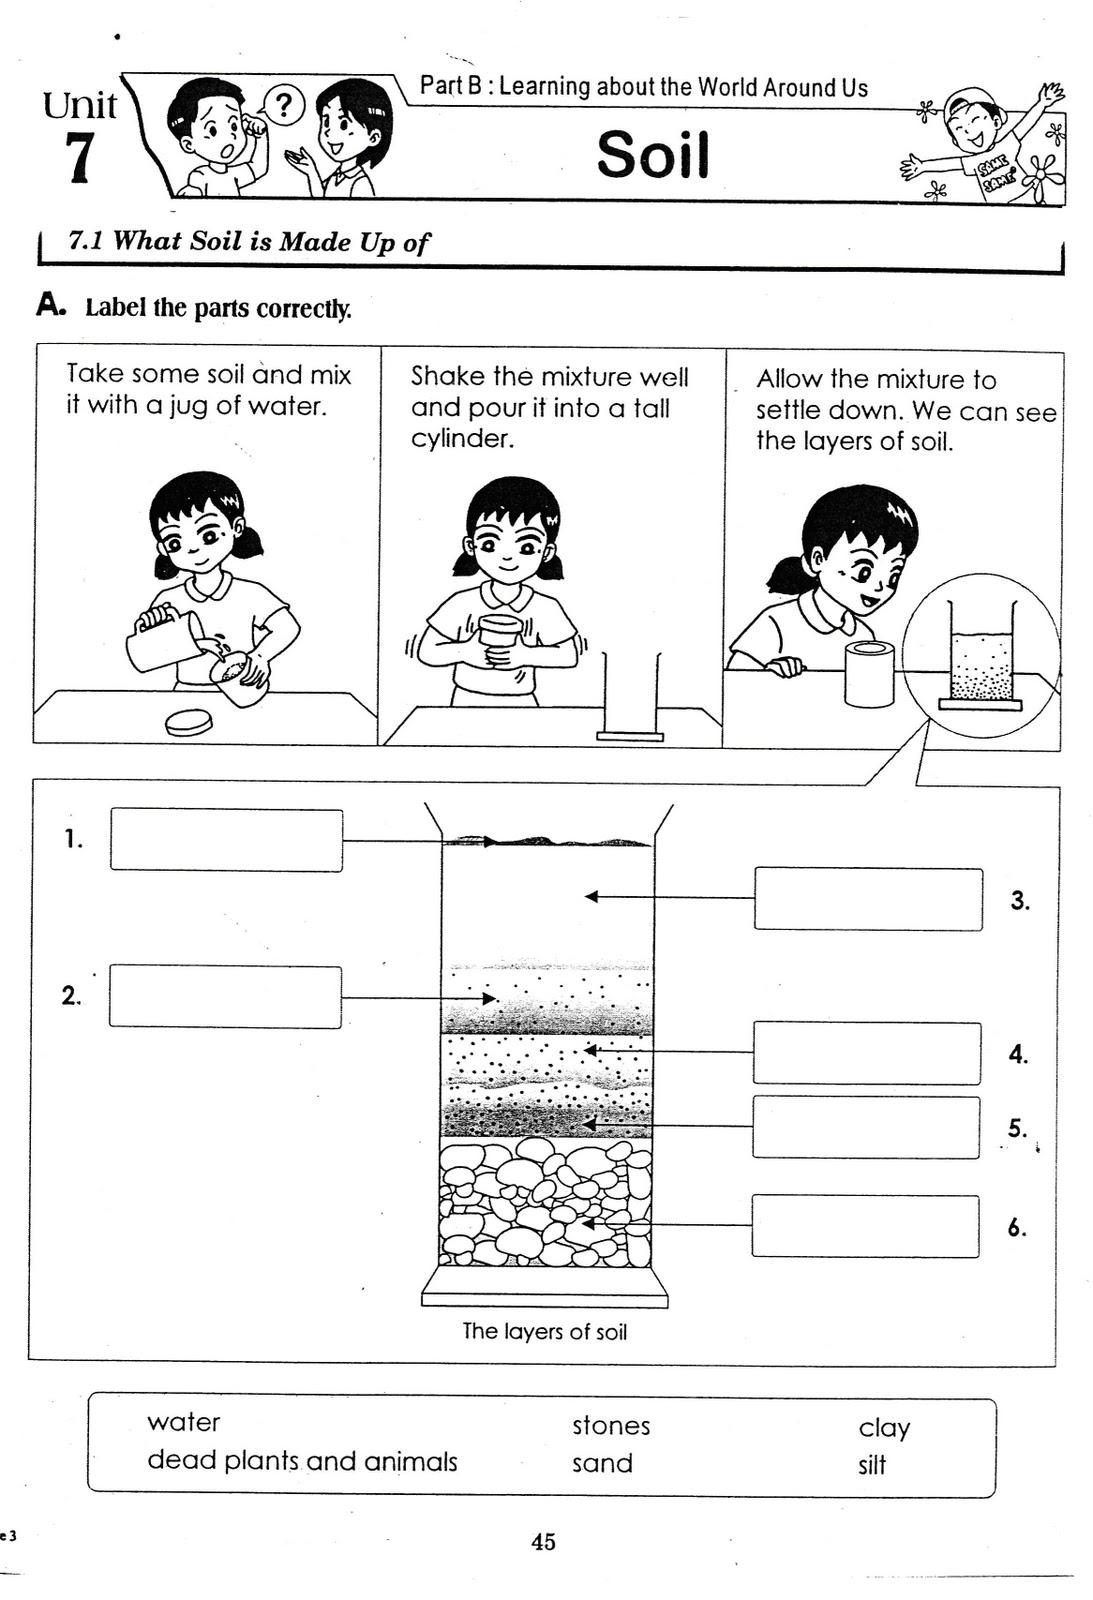 Soil Layers Worksheet | www.imgkid.com - The Image Kid Has It!